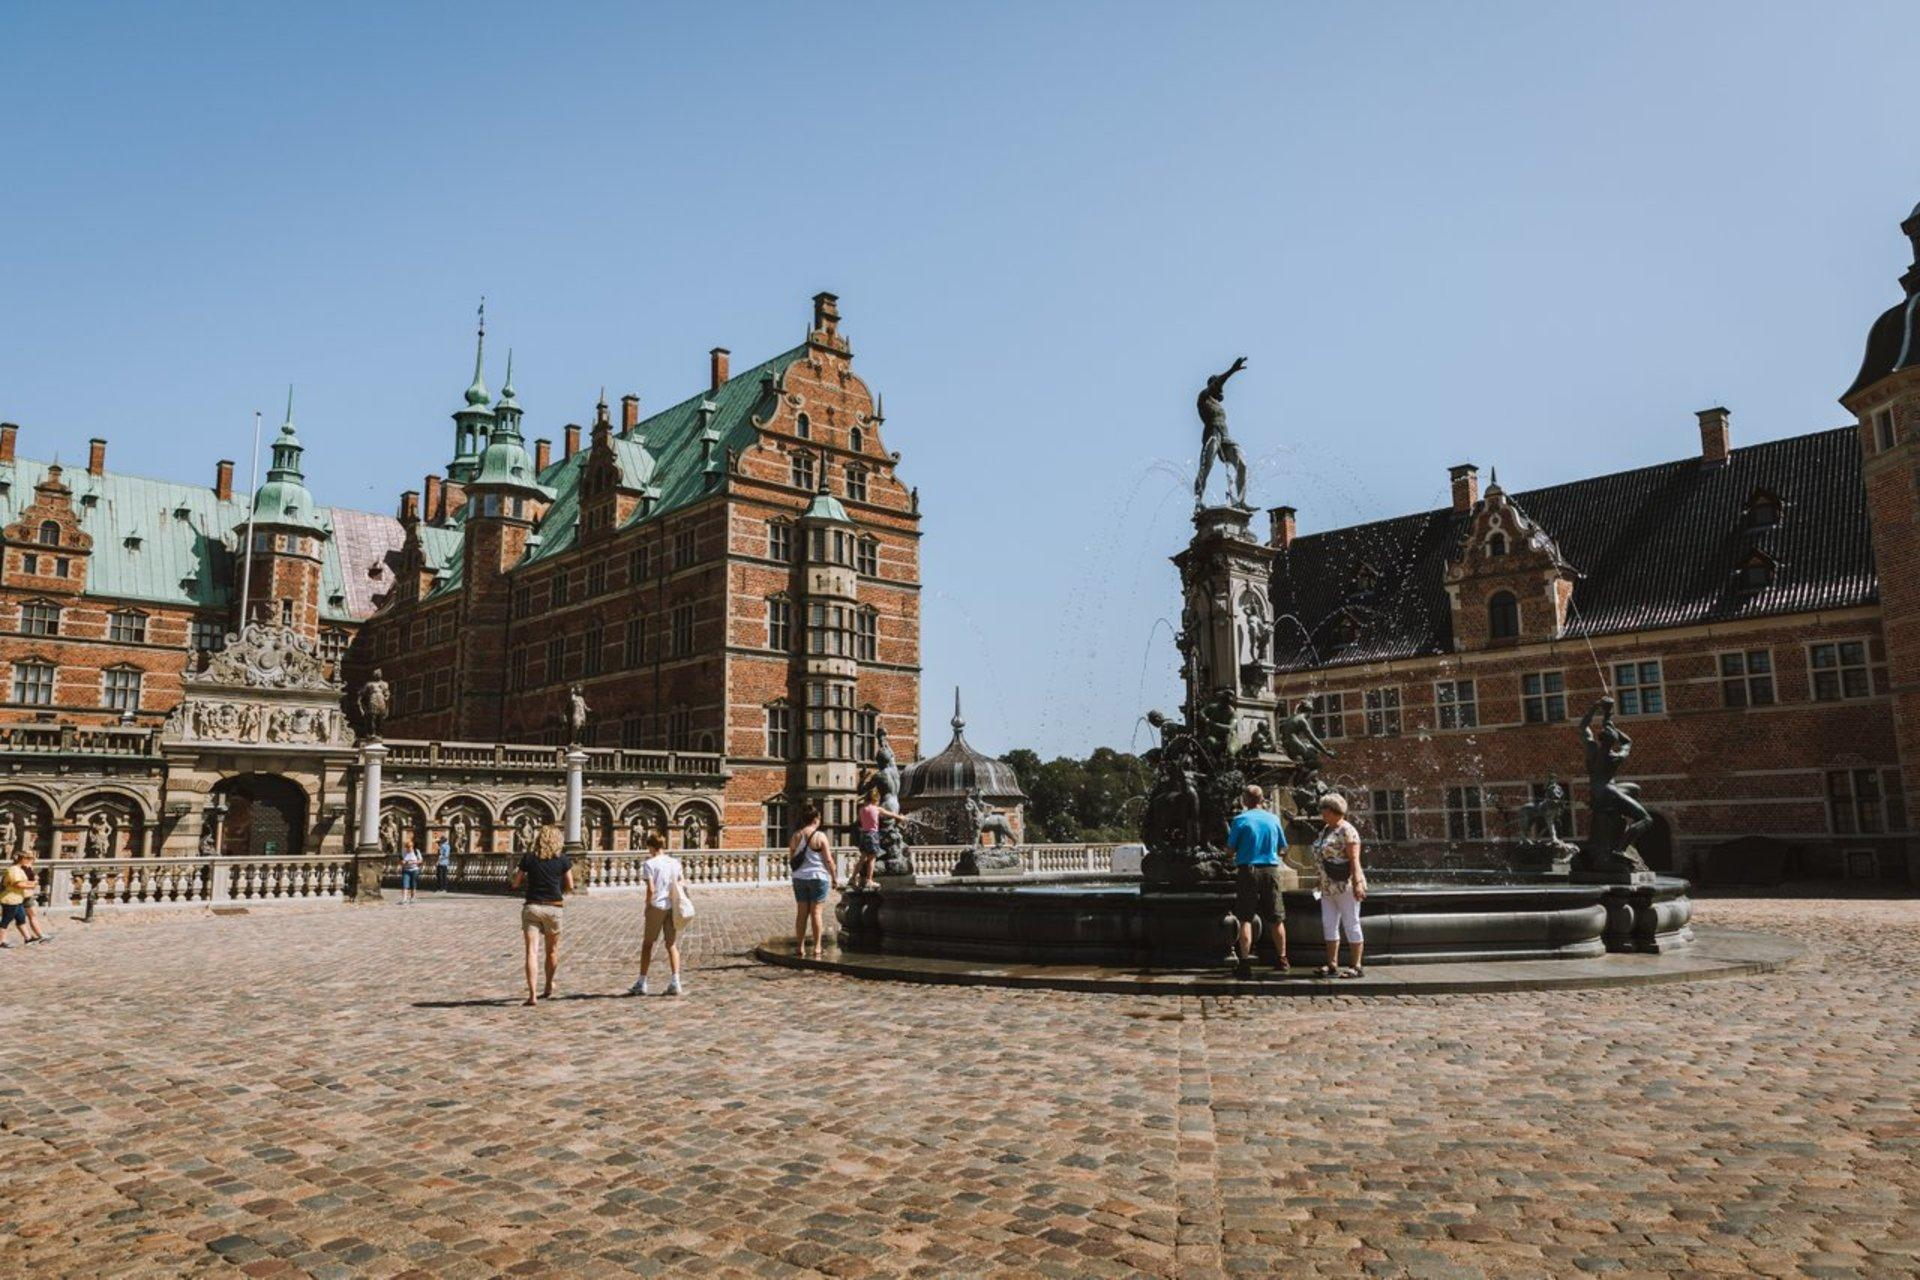 12 castles you should visit in Denmark Thumbnail